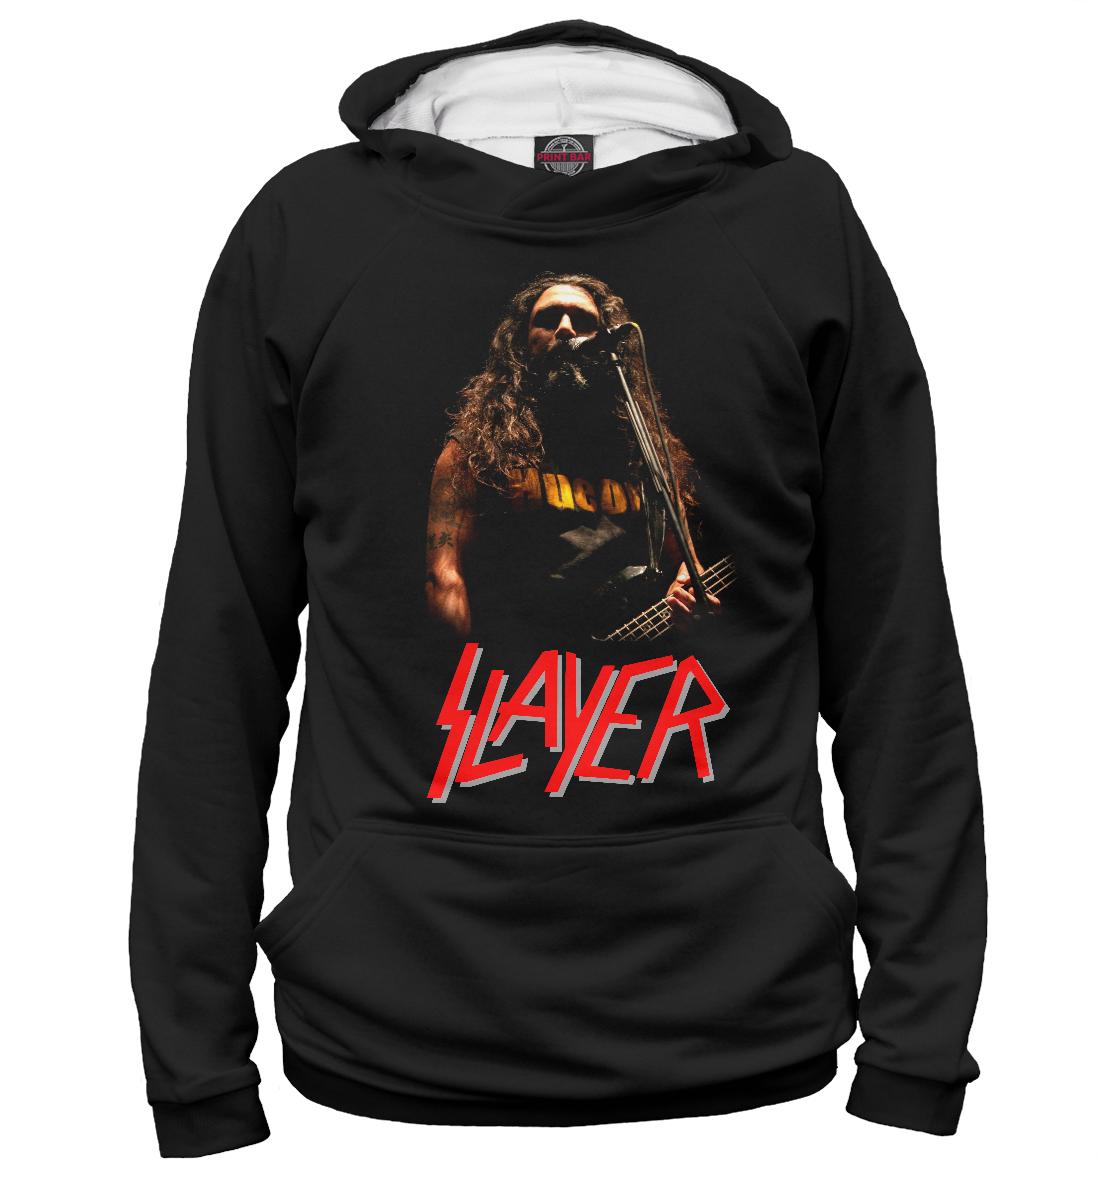 Купить Slayer, Printbar, Худи, SLR-385457-hud-1